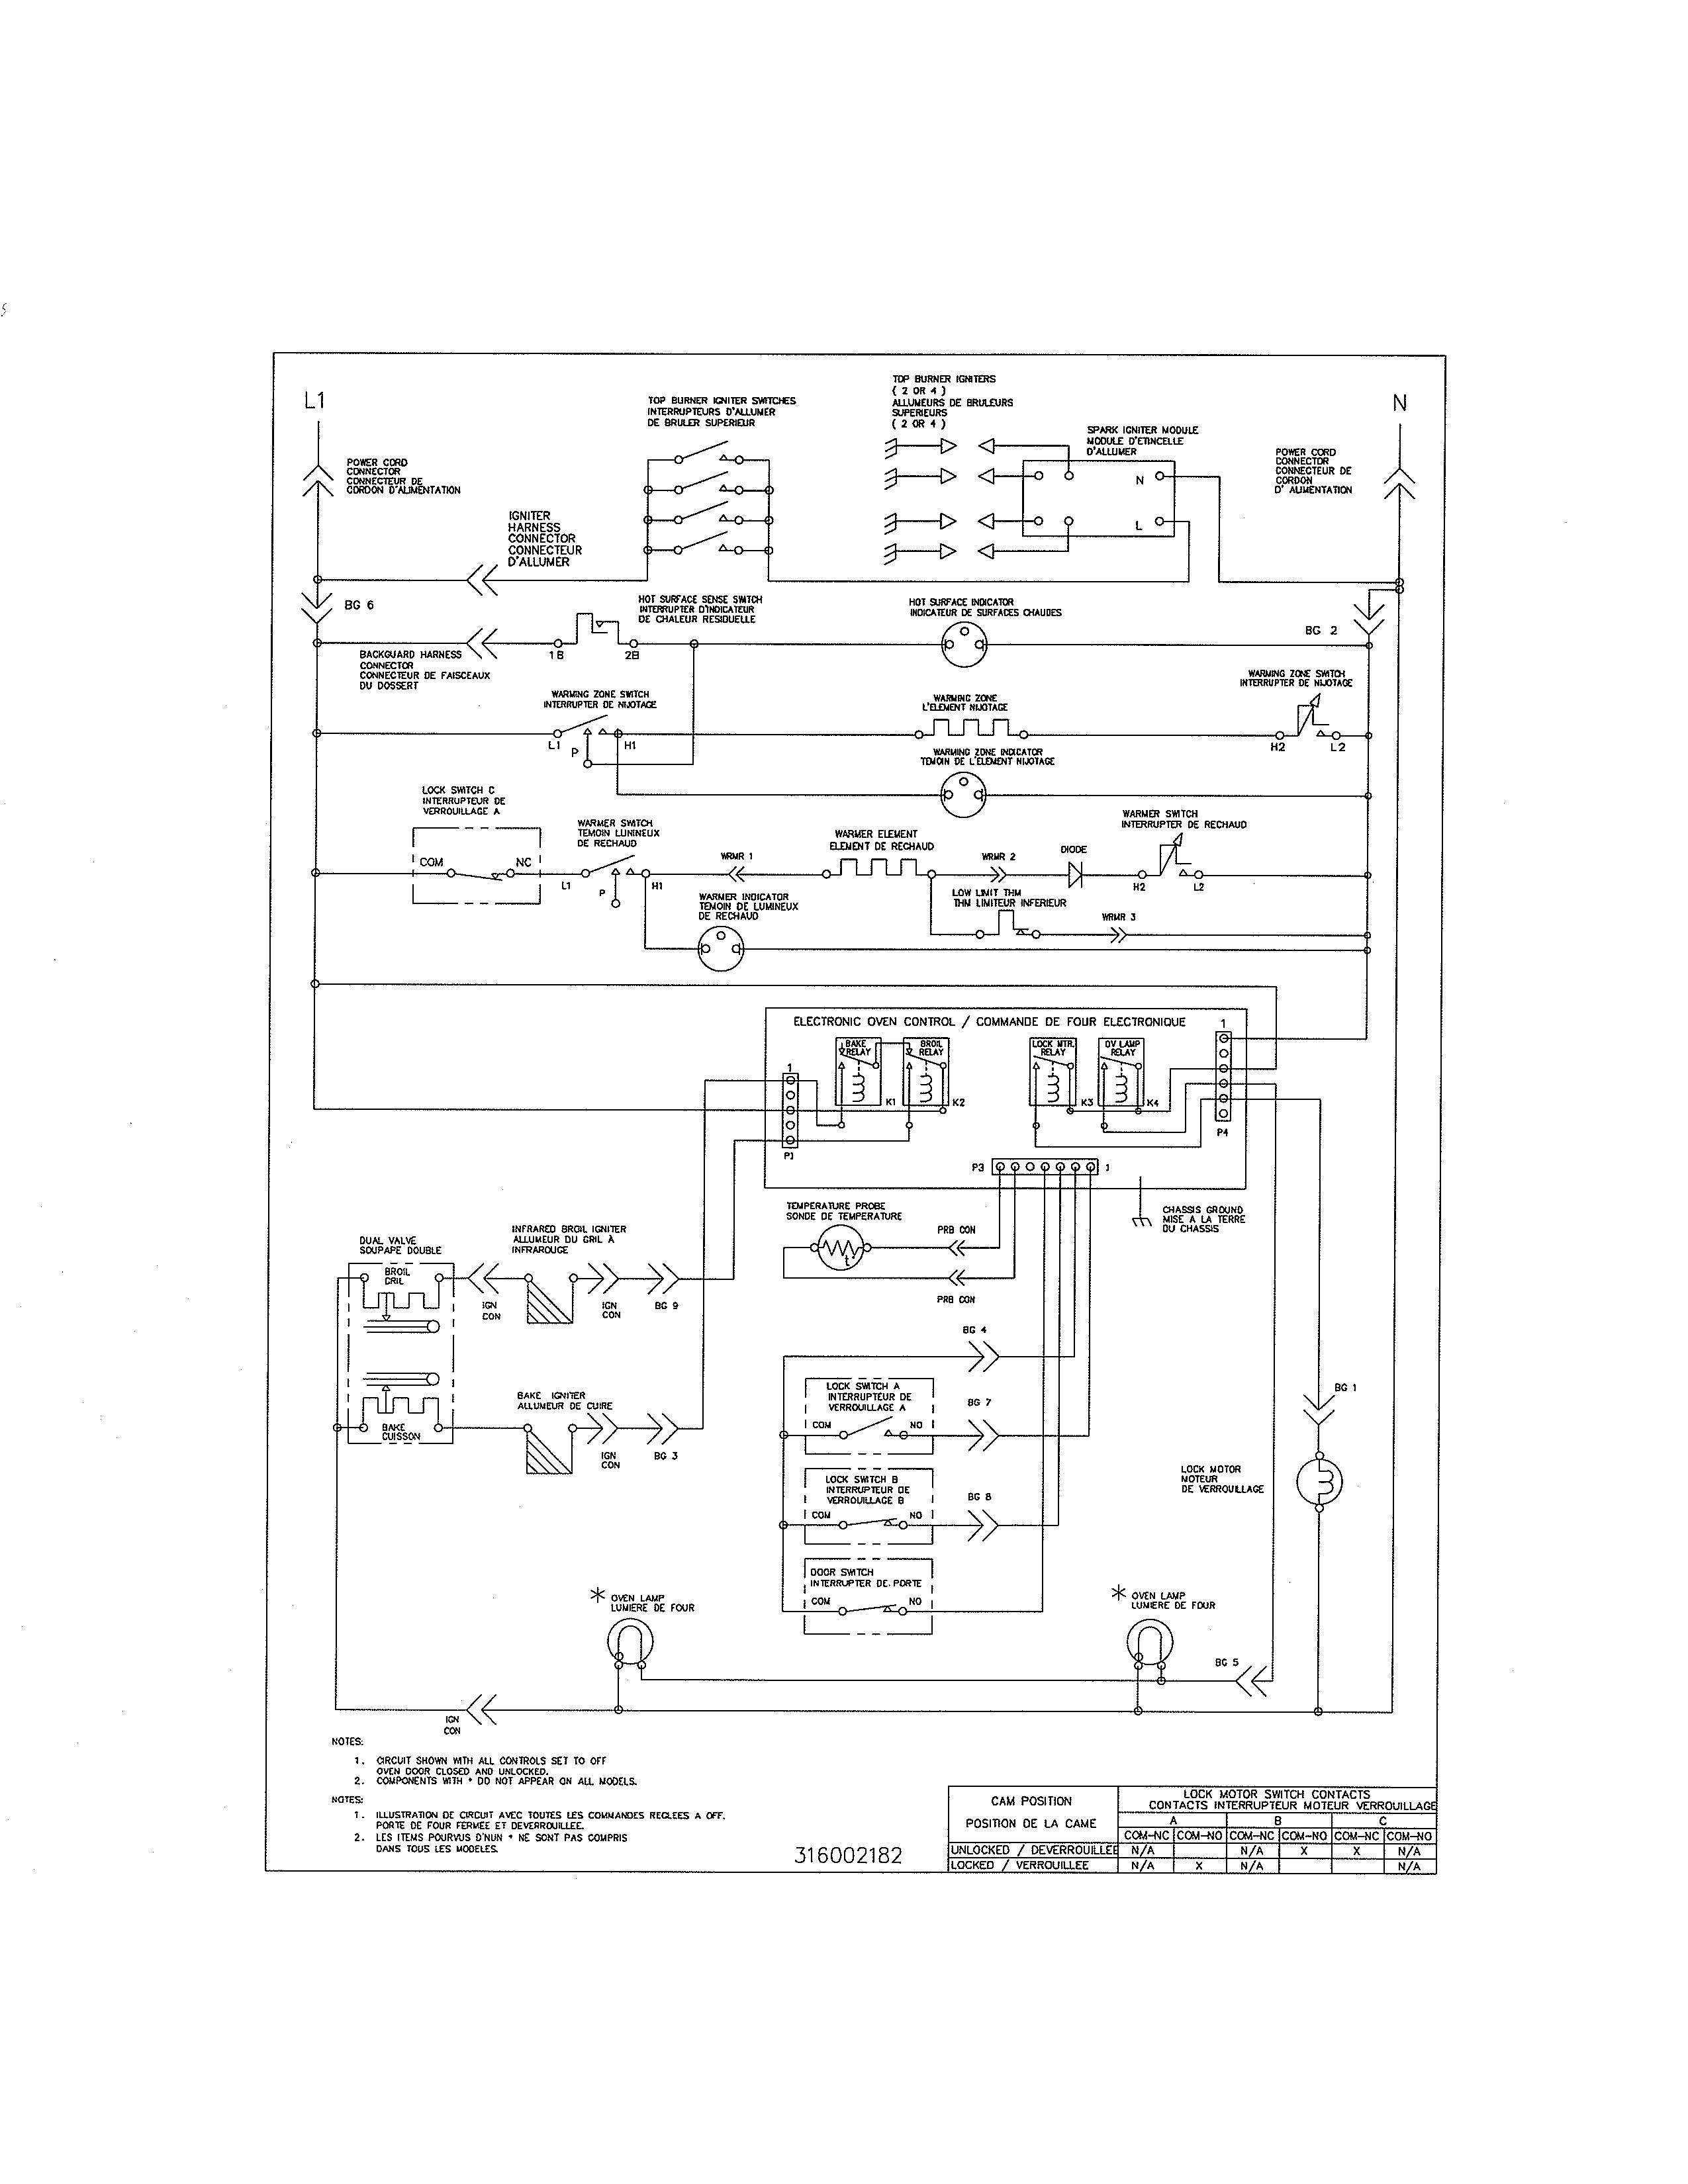 Wiring Diagram For Electric Smoker Element 42 Masterbuilt Circuit Breaker Diagrams Partsresize